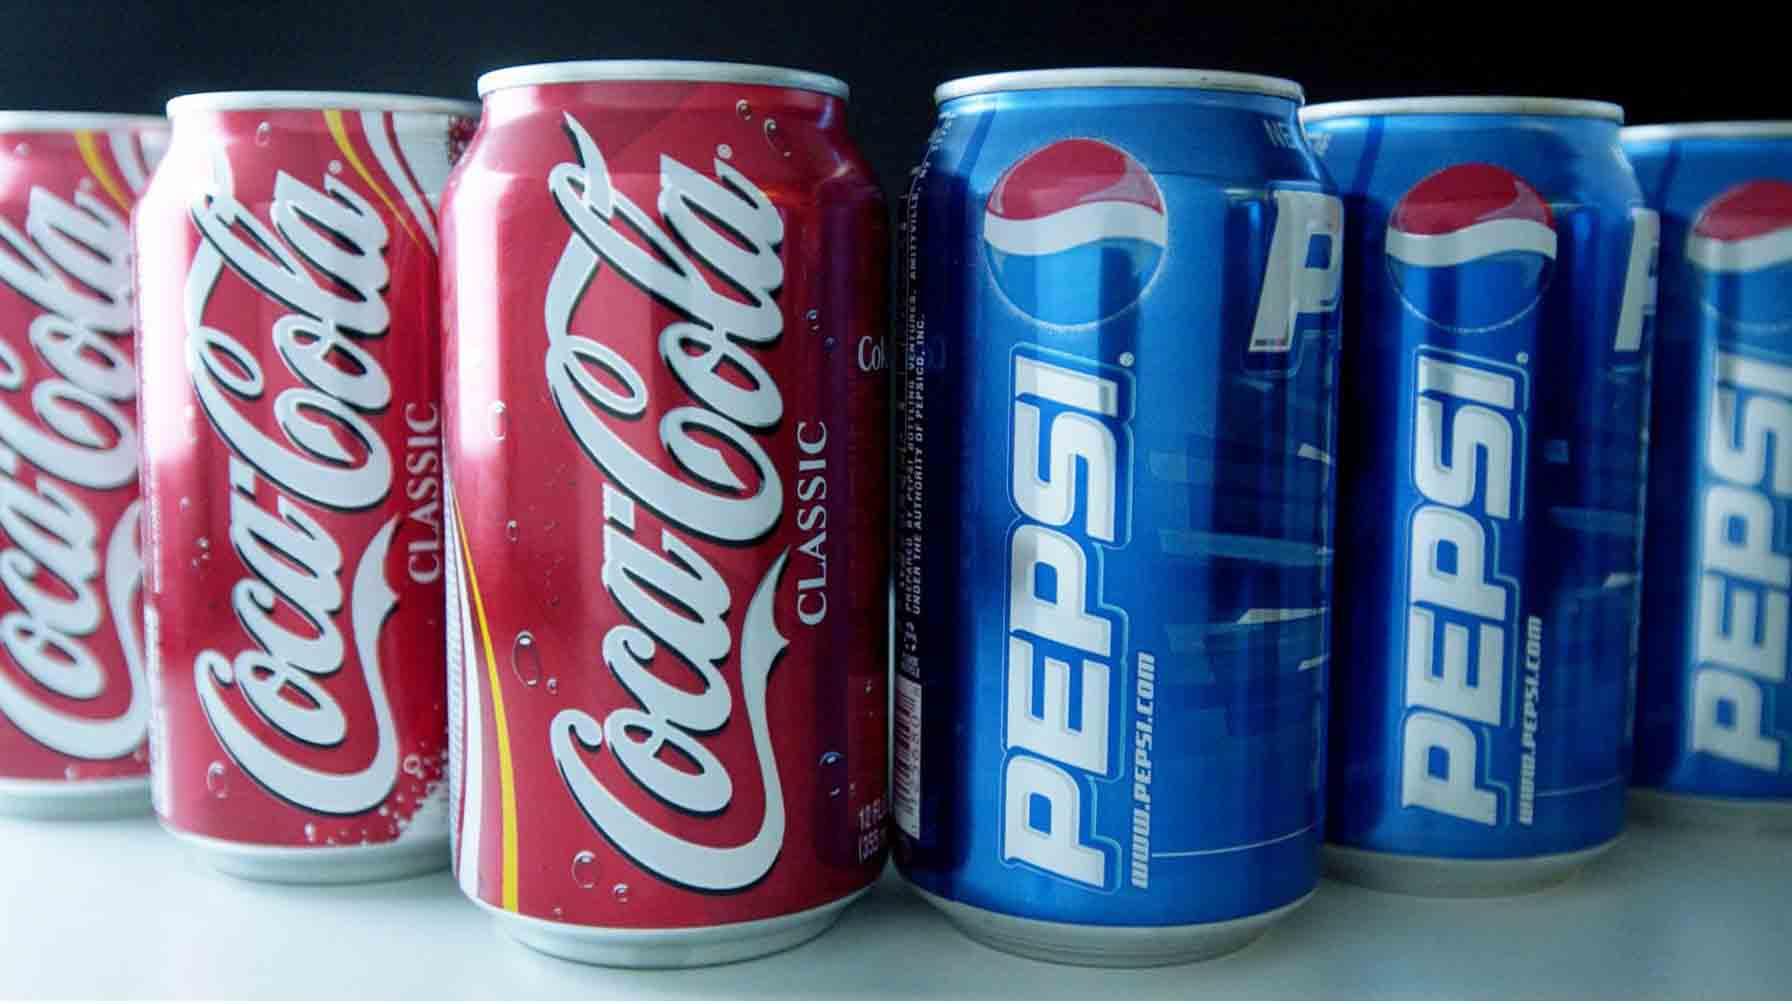 Despite the ban lift, PepsiCo yet to resume operations in Tirunelveli plant